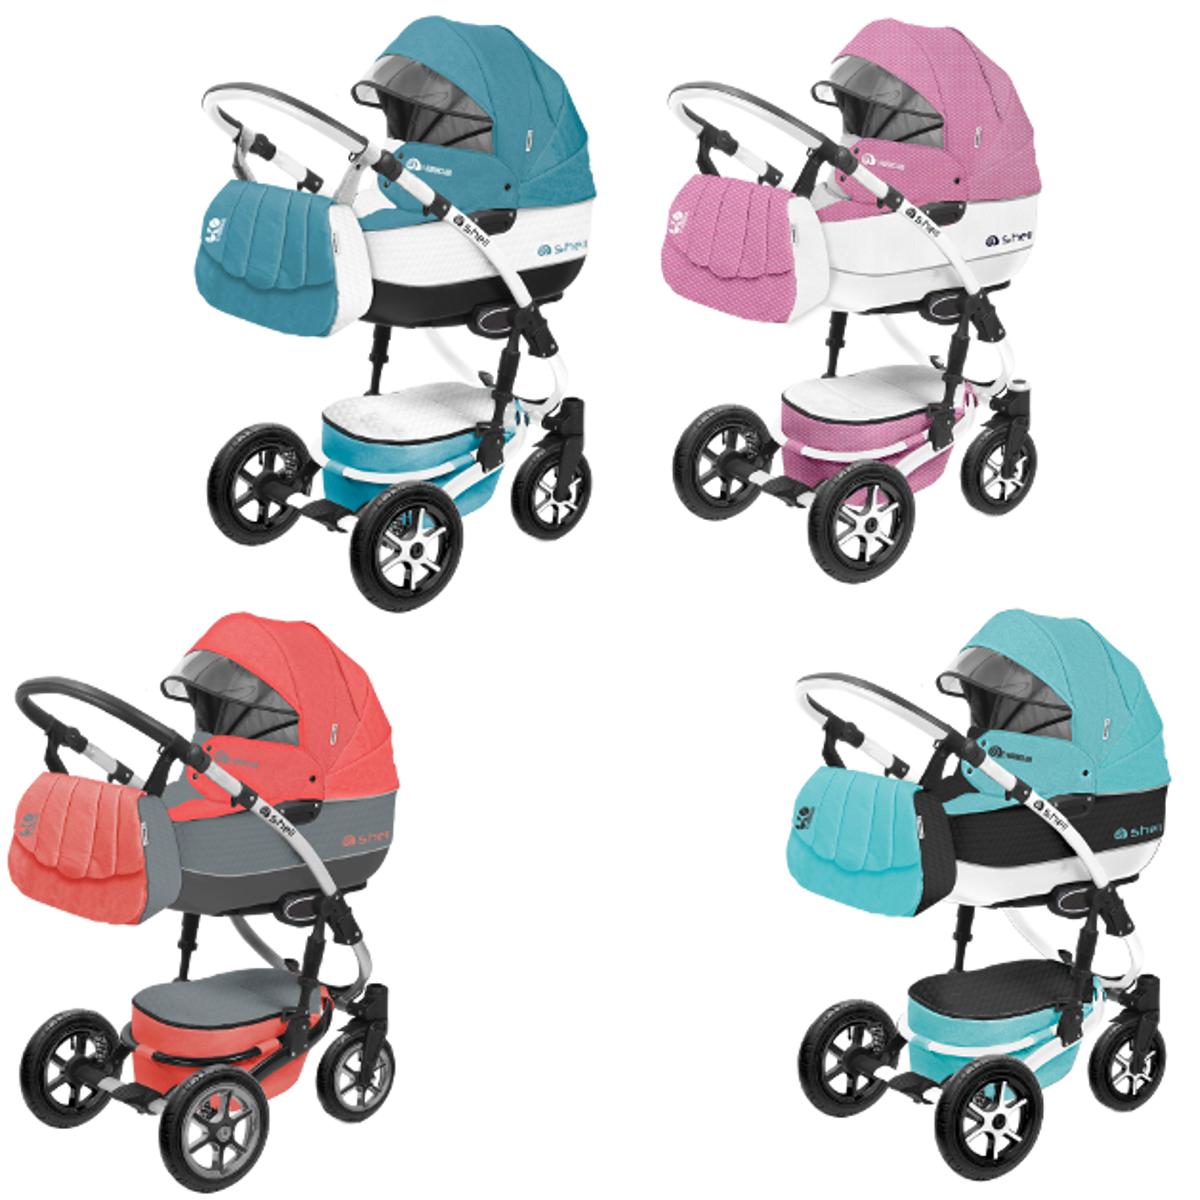 shell kombi kinderwagen 2in1 oder 3in1 mit babywanne. Black Bedroom Furniture Sets. Home Design Ideas